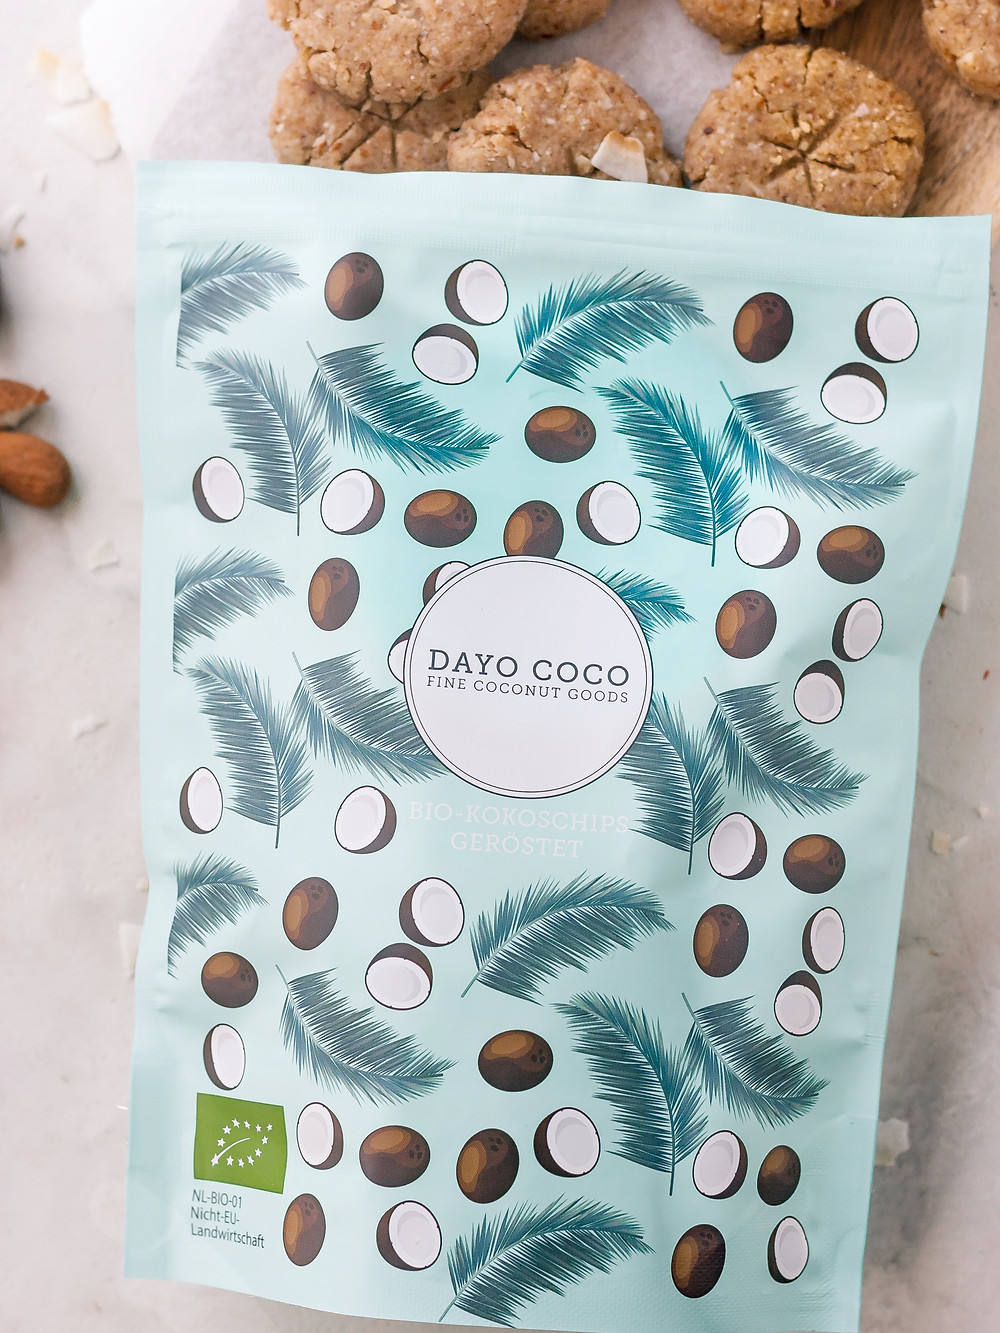 Dayo Coco geröstete Bio Kokoschips